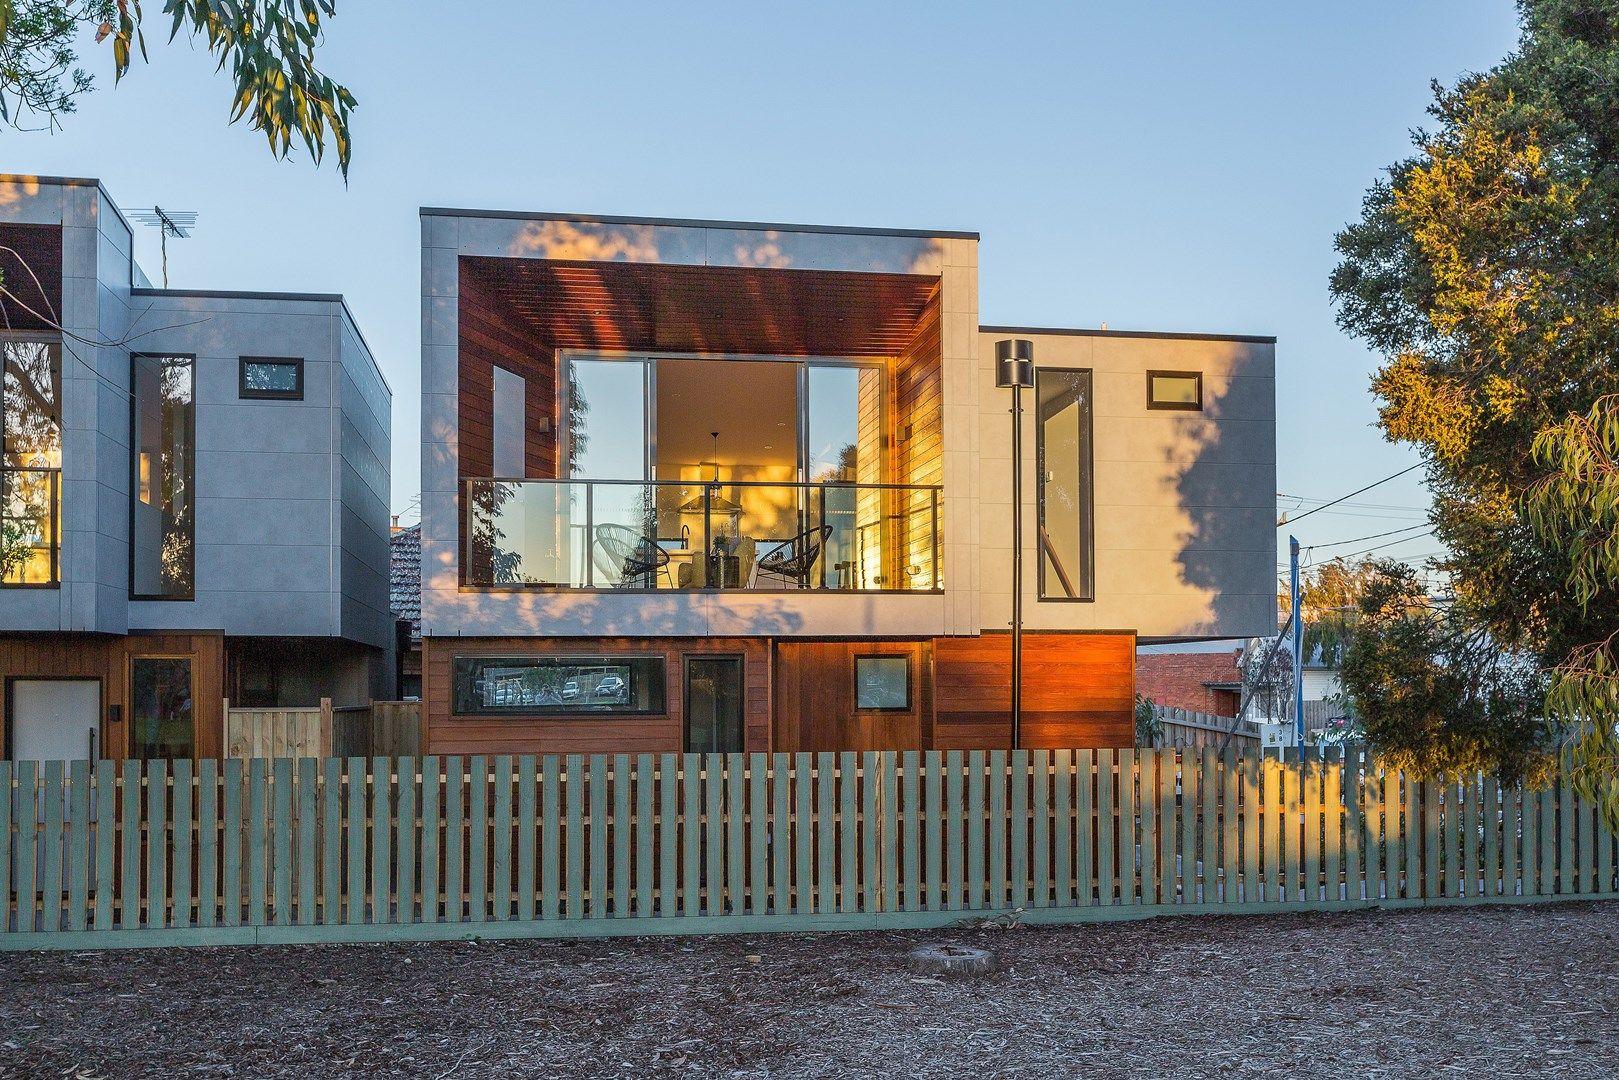 1/672 Barkly Street, West Footscray VIC 3012, Image 1